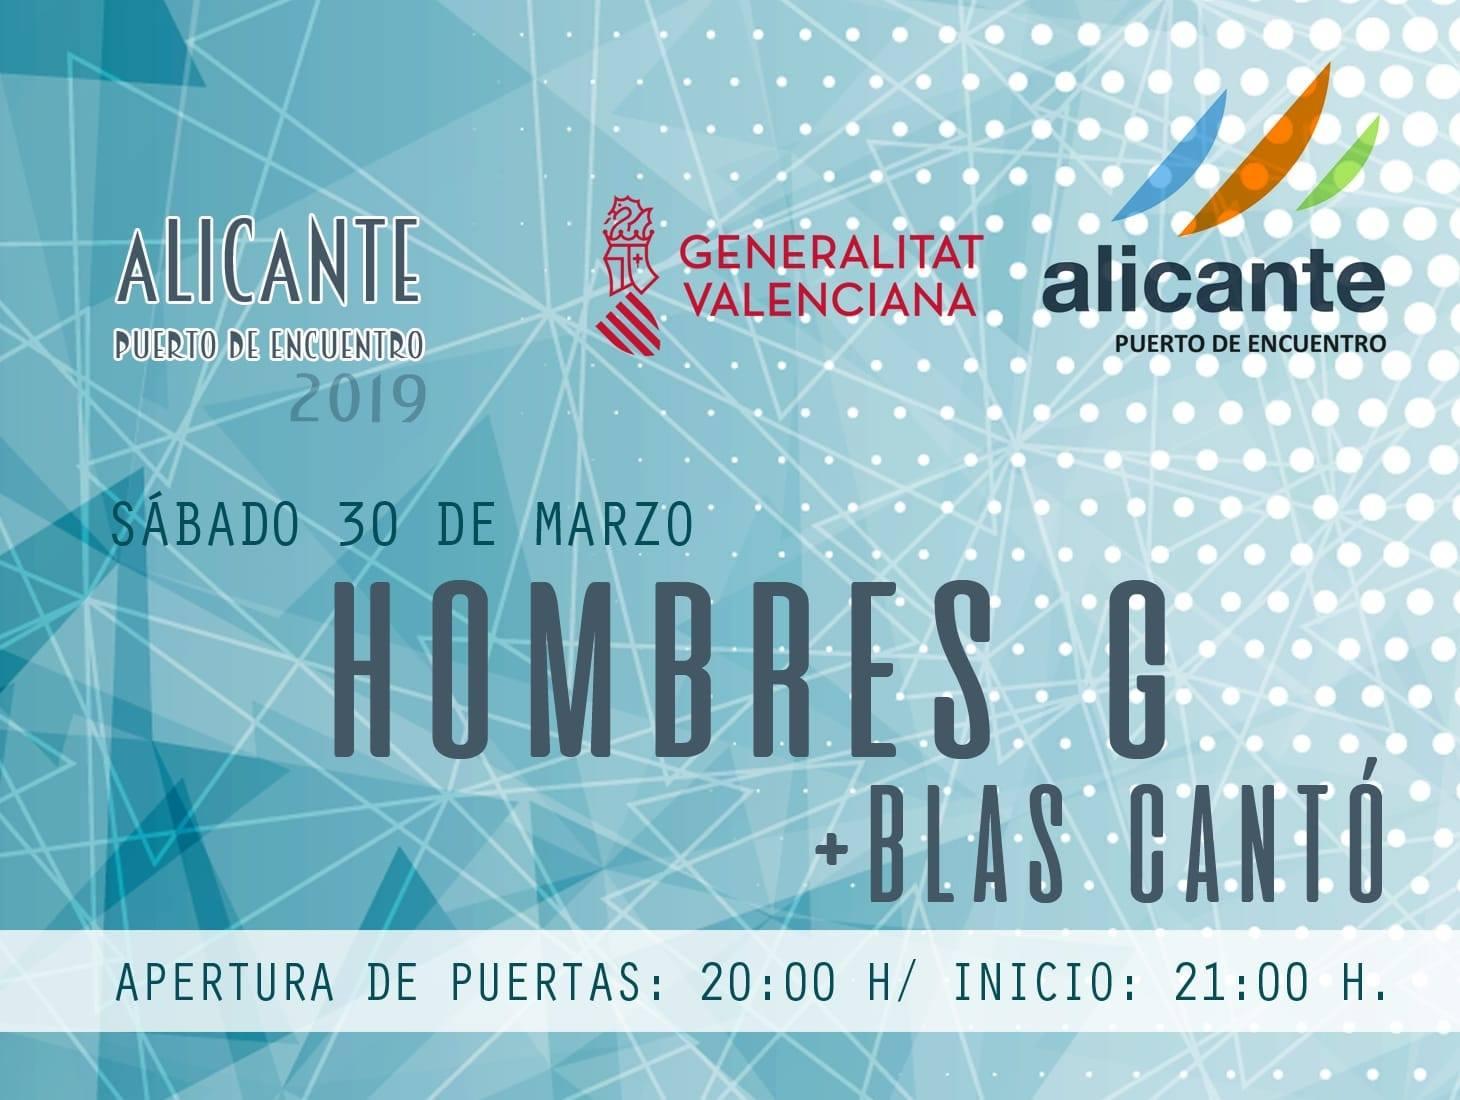 hombres-g-blas-canto-5c58045611d3a.jpeg